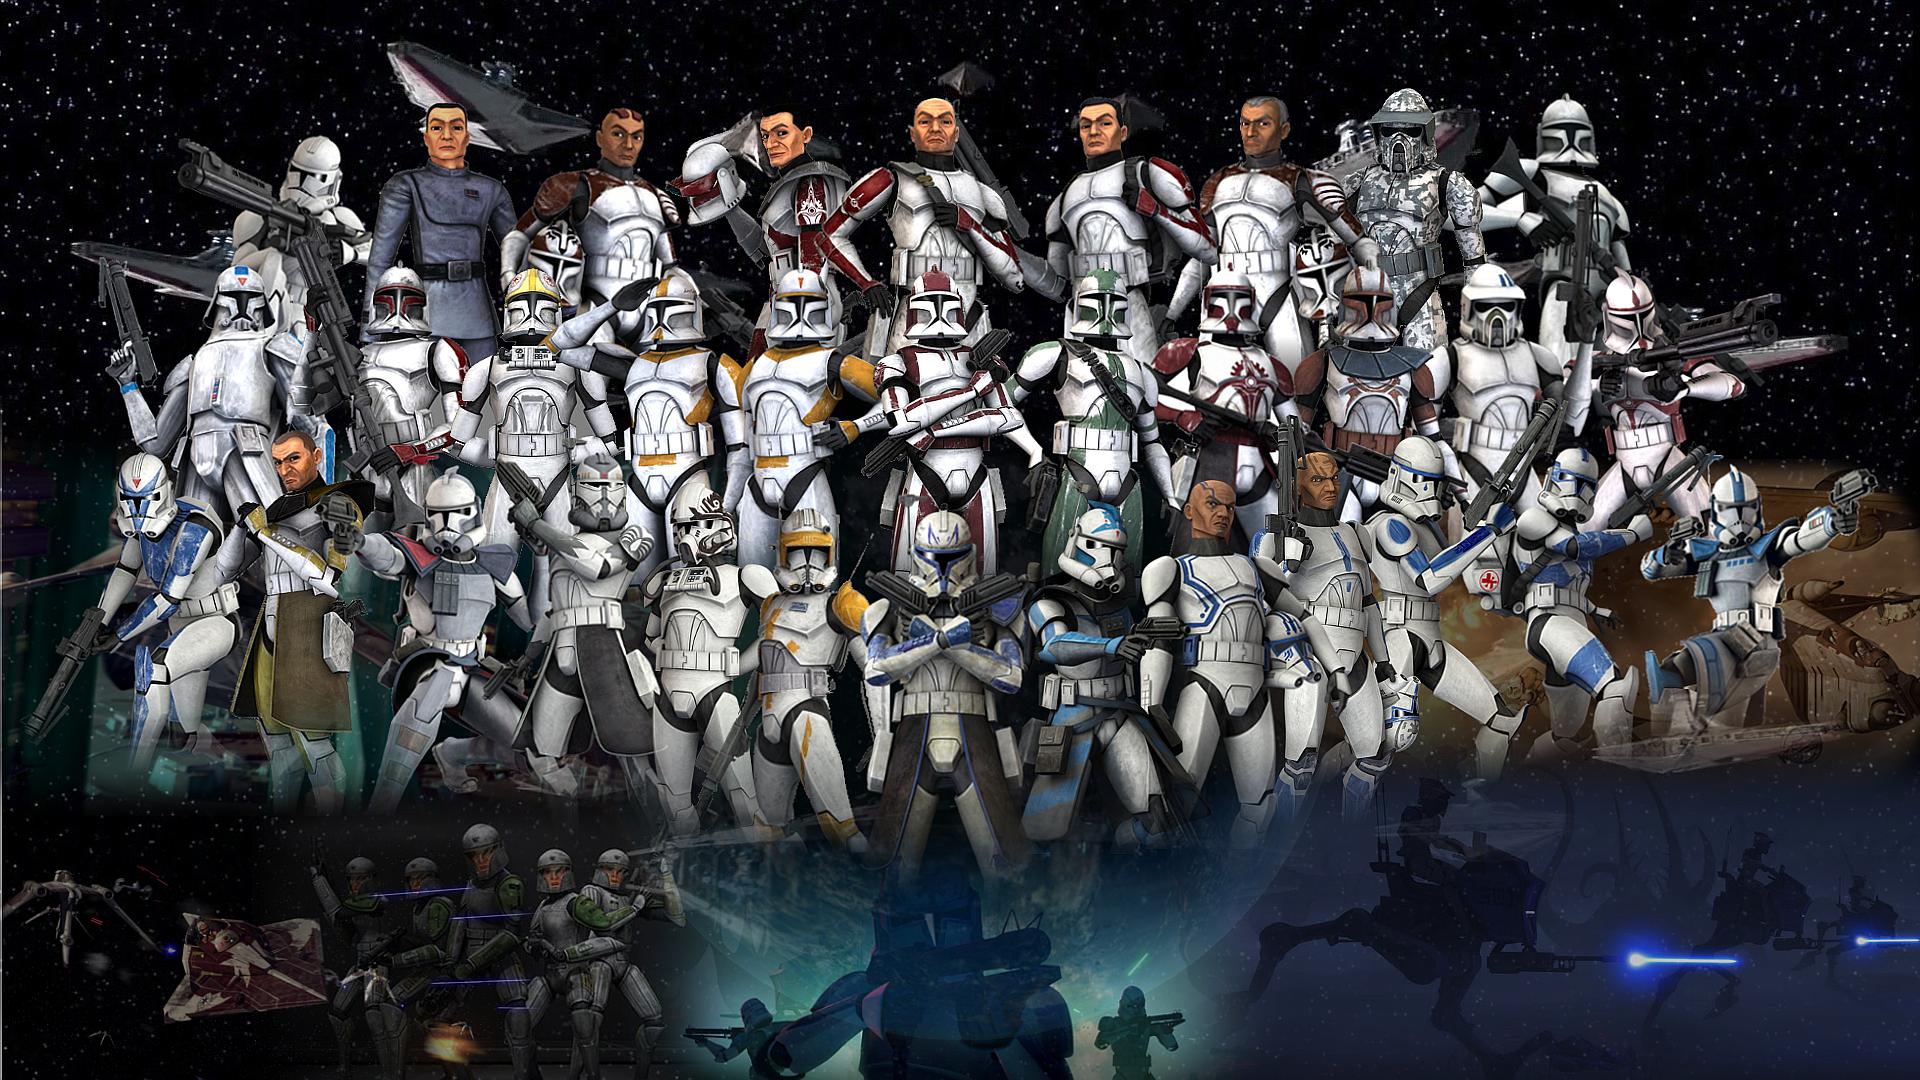 Clone Troopers Wallpaper by Volkrex on DeviantArt